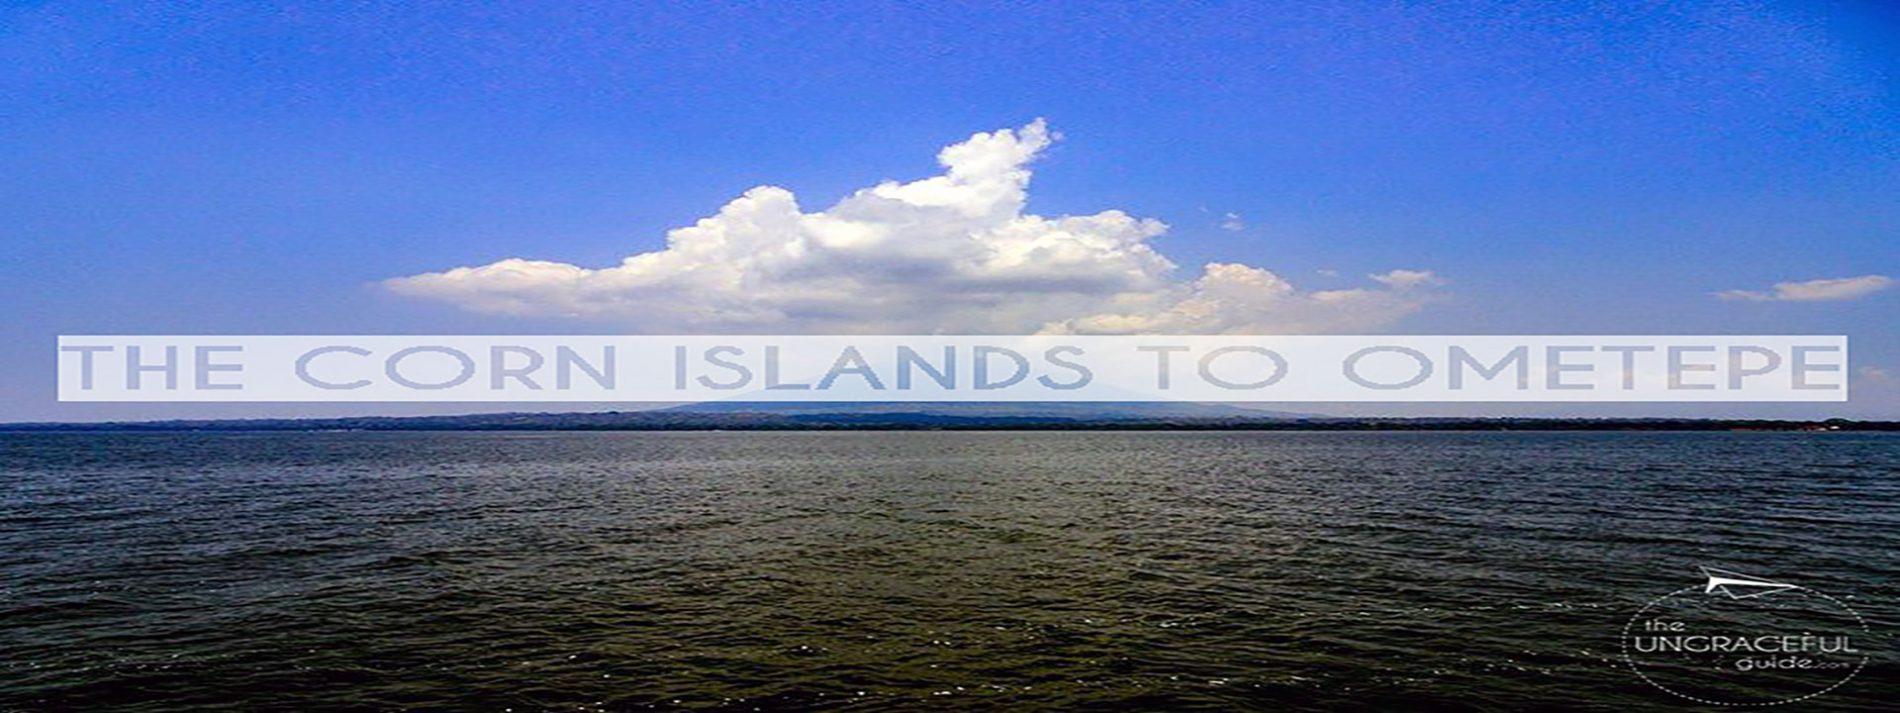 "<img src=""data:image/gif;base64,R0lGODdhAQABAPAAAP///wAAACwAAAAAAQABAEACAkQBADs="" data-lazy-src=""images/"" width=""800"" height=""600"" alt=""ometepe - Corn to Ometepe - Nicaragua: The Corn Islands To Ometepe (Without Flying)"">"